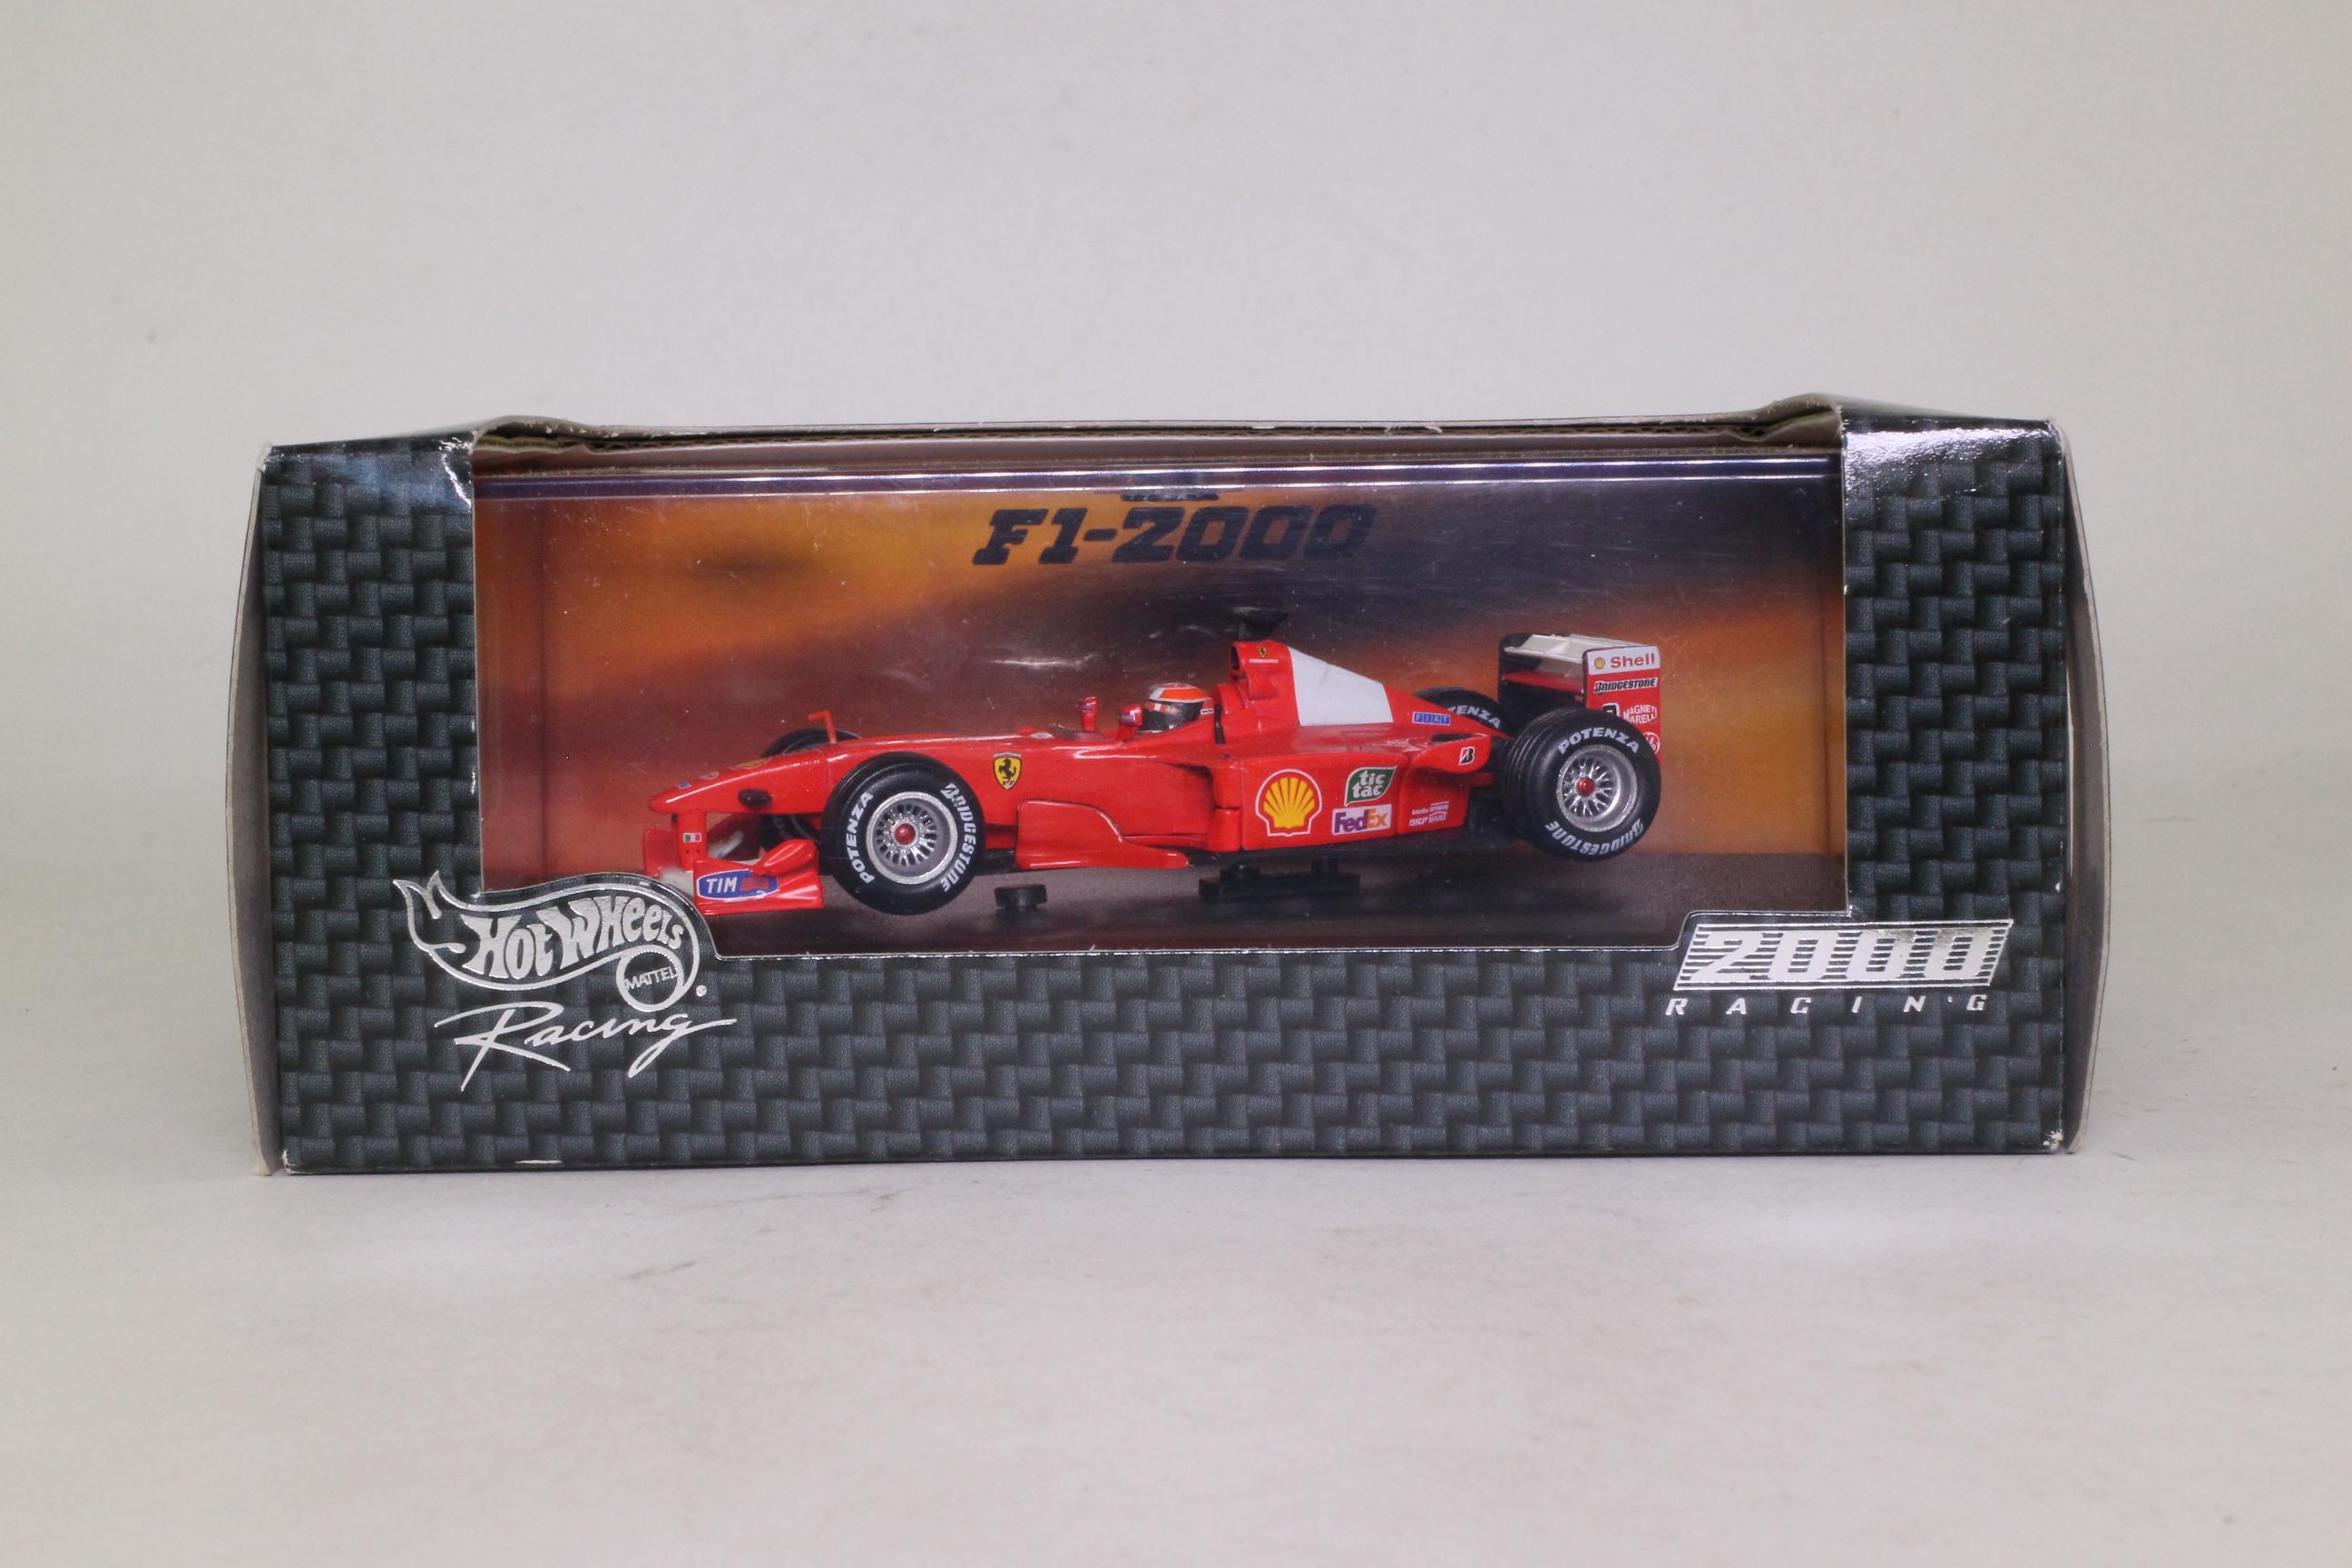 Hot Wheels 26748; Ferrari F1-2000 Formula 1; 2000 World Champion, Michael Scumacher; RN3